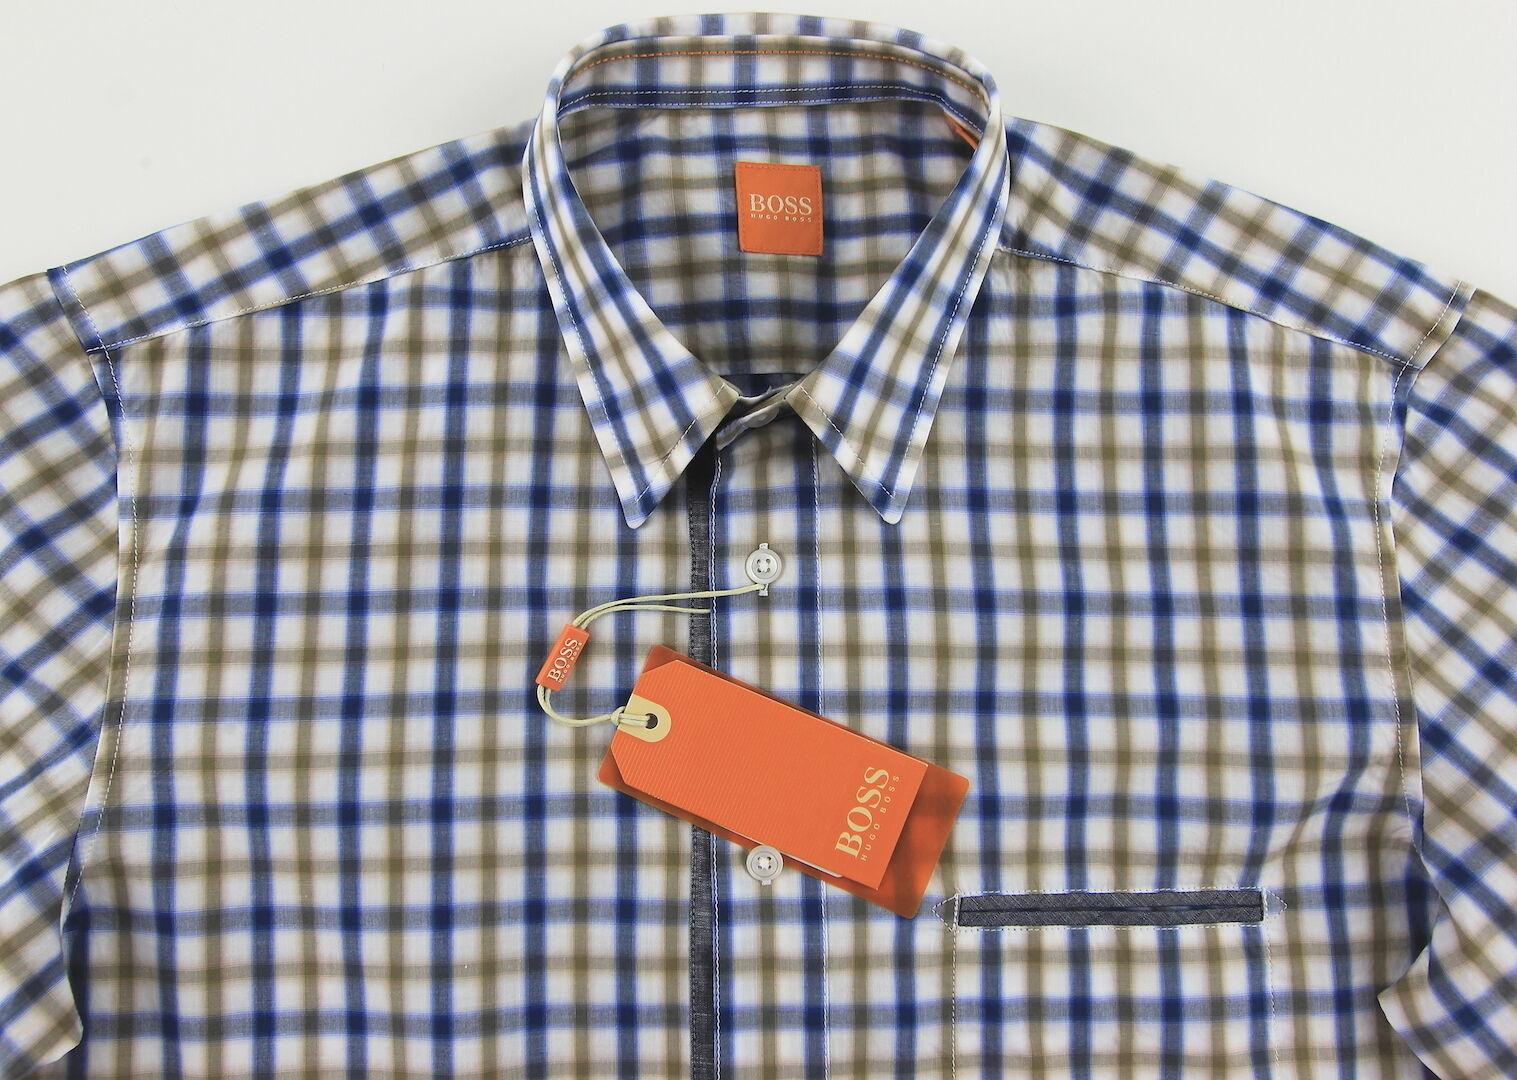 Men's HUGO BOSS orange White bluee gold Plaid Shirt XL XLarge NWT NEW CieloebuE